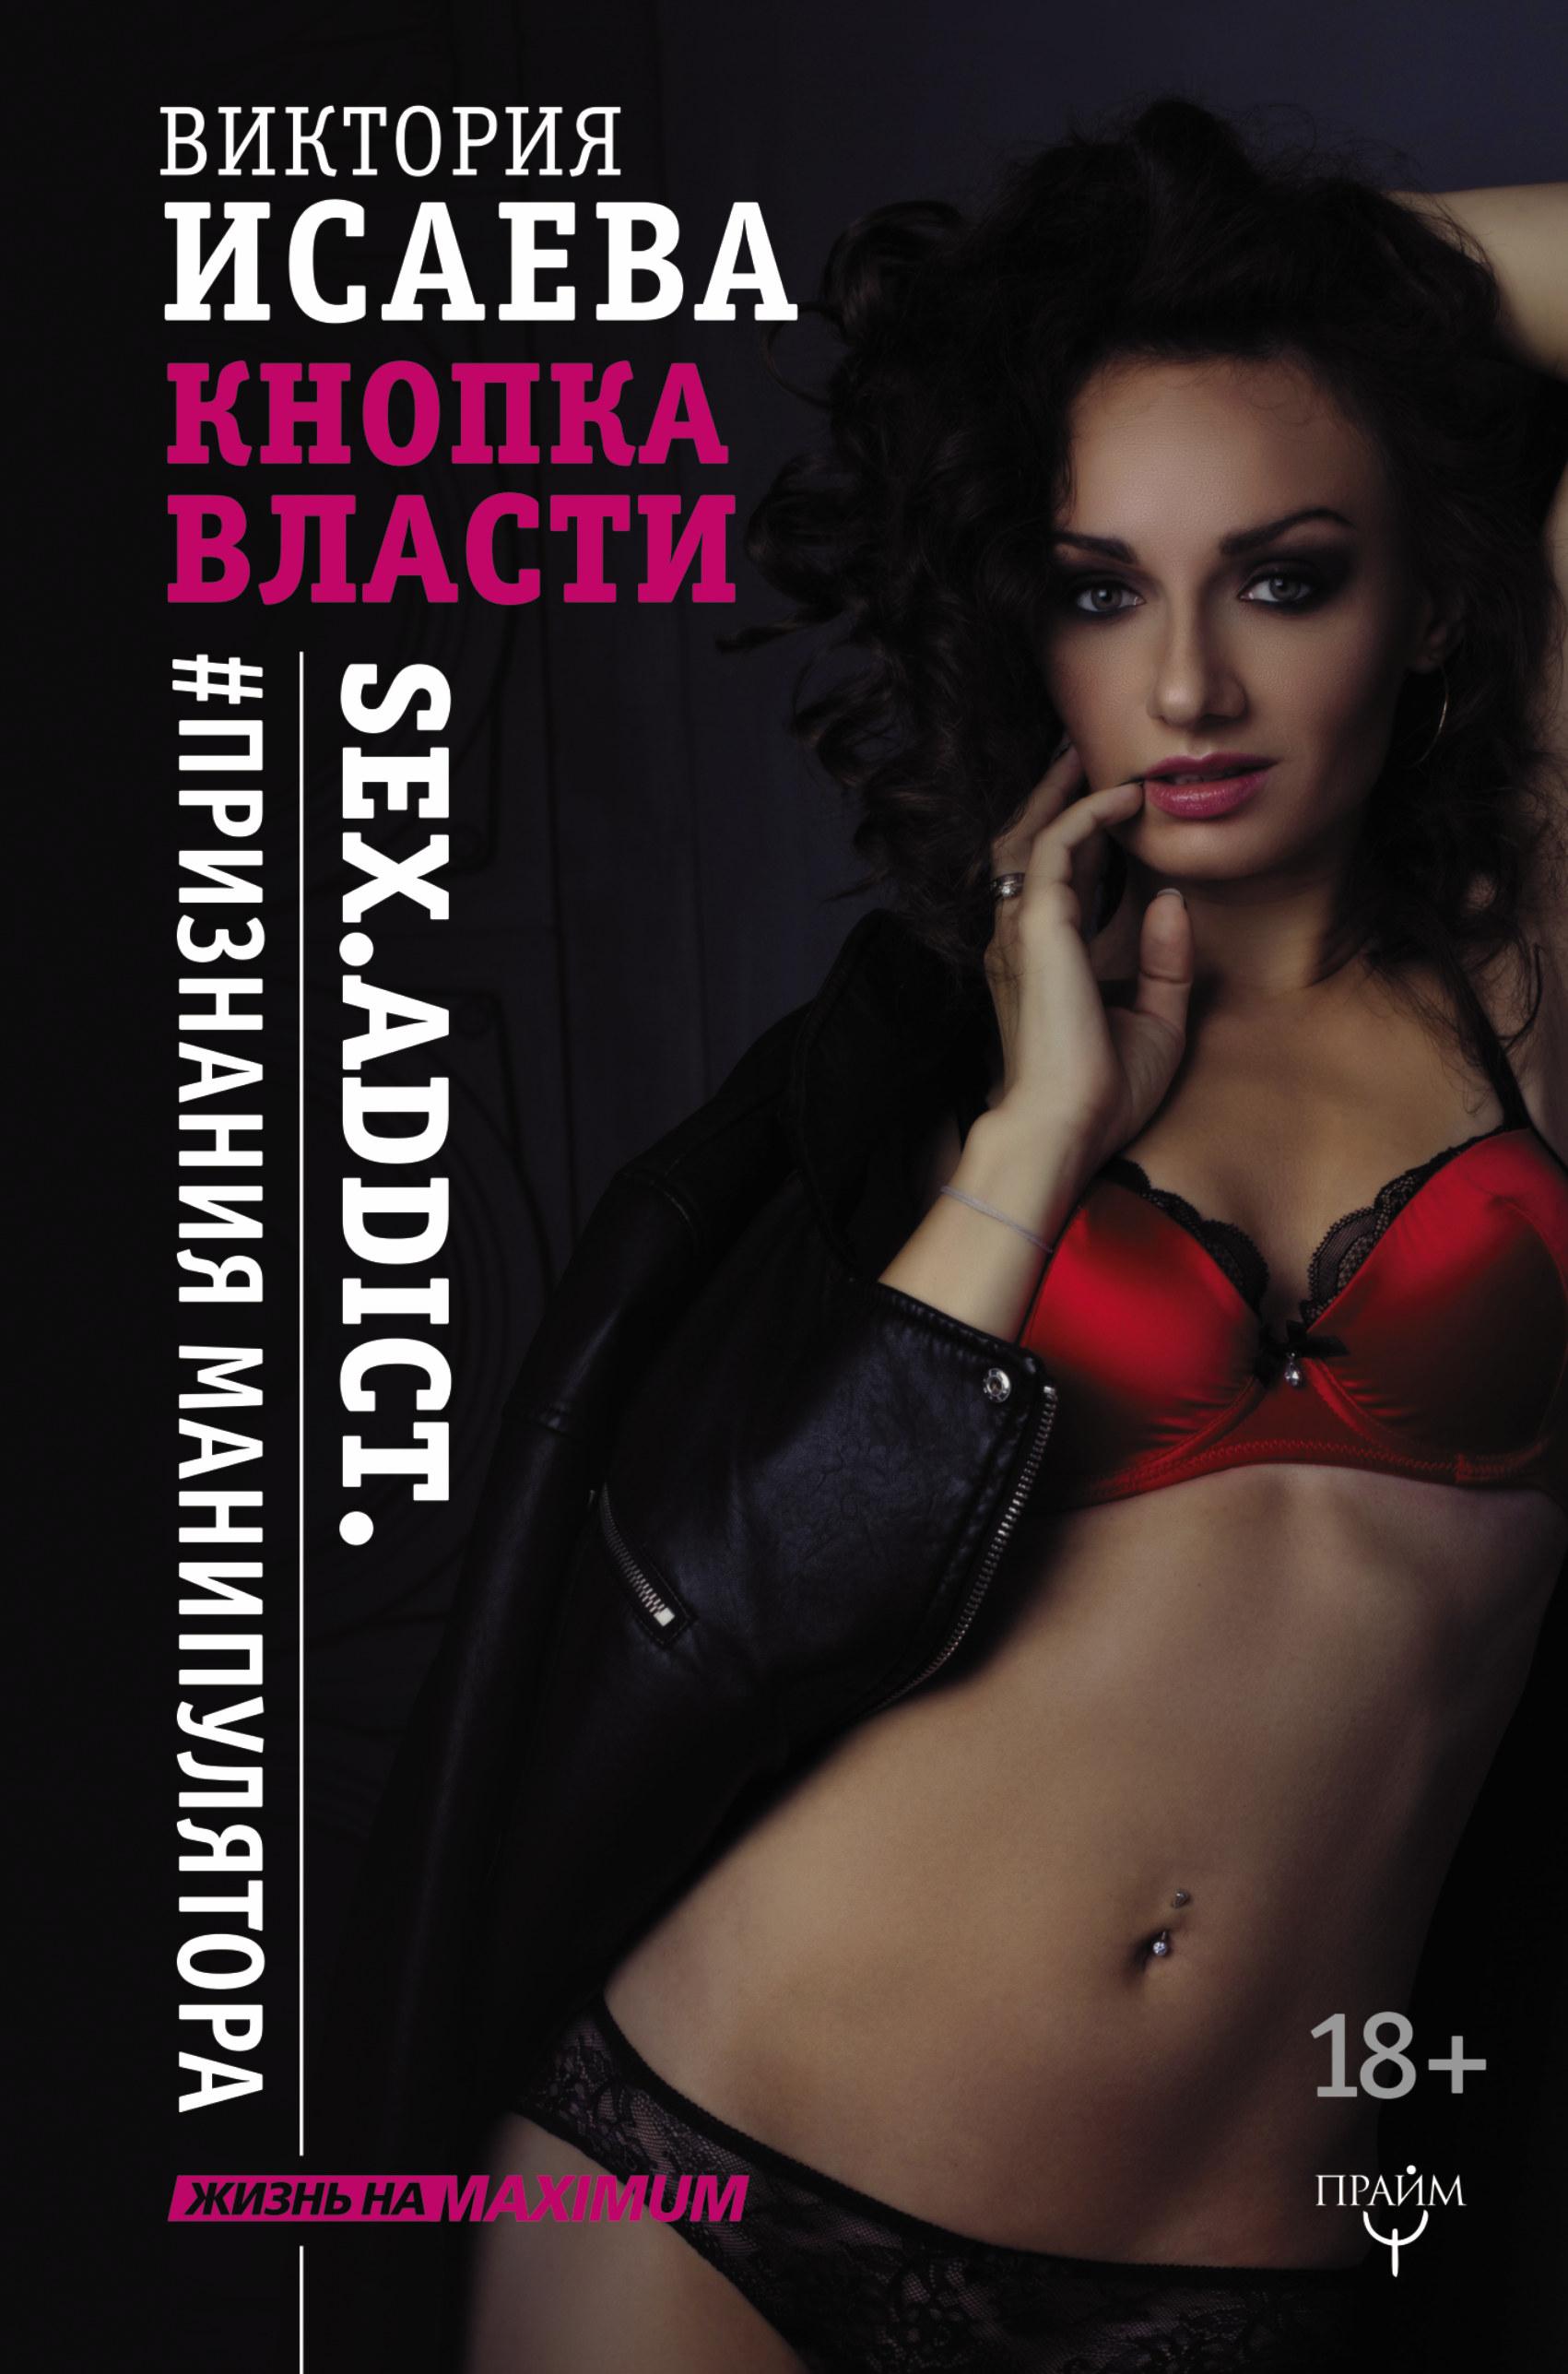 Кнопка Власти. Sex. Addict. # Признания манипулятора